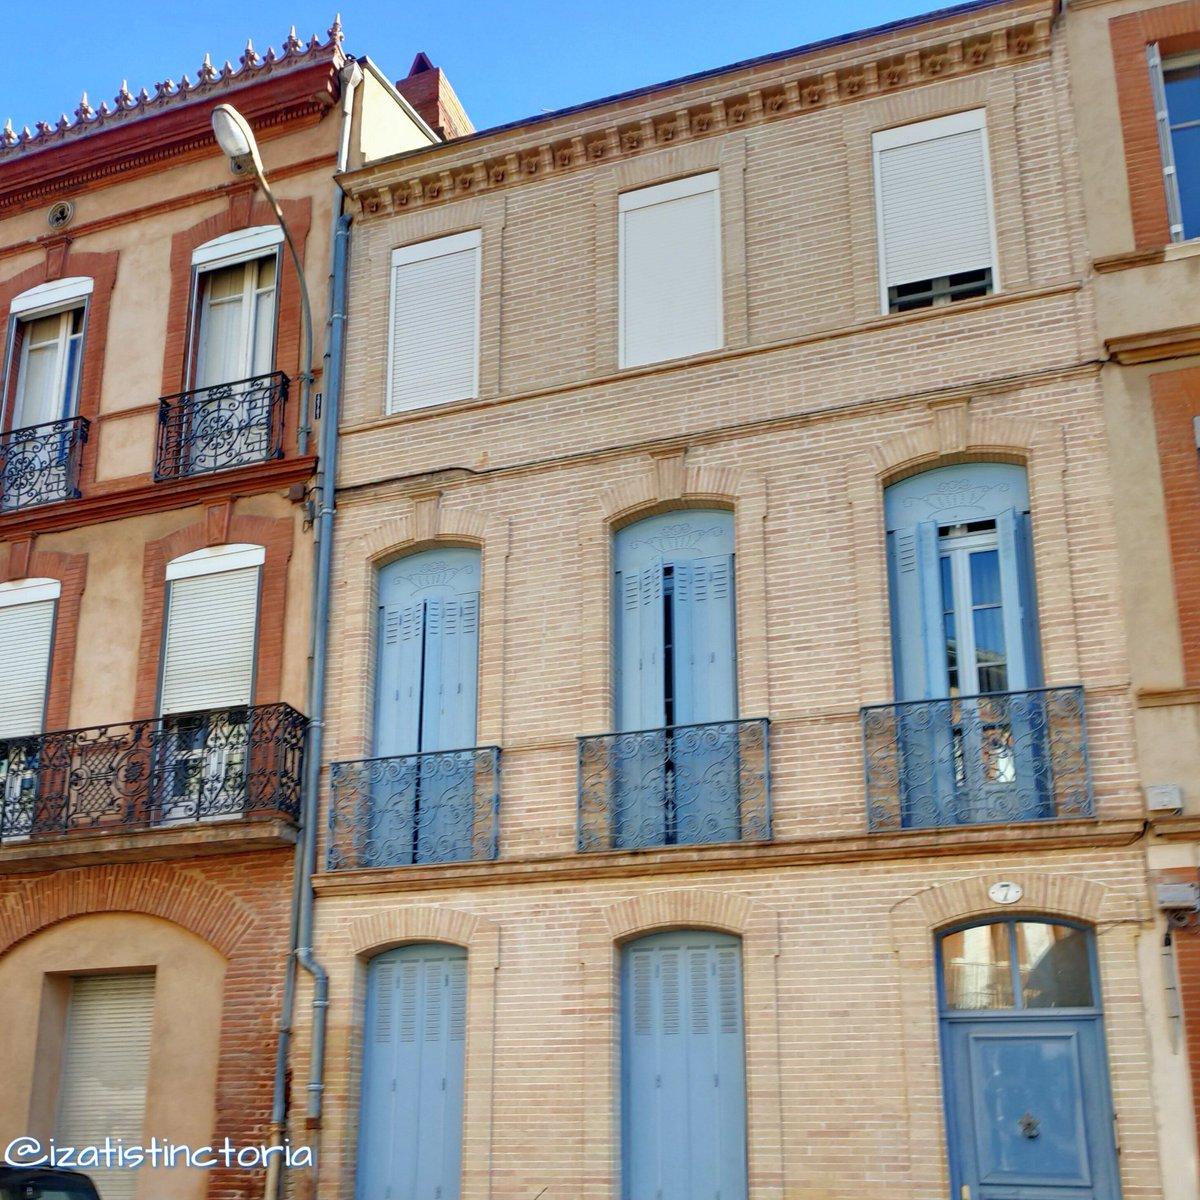 #IsatisRandomPhotos #Toulouse Rue Raymond IV pic.twitter.com/42zepl2BUE